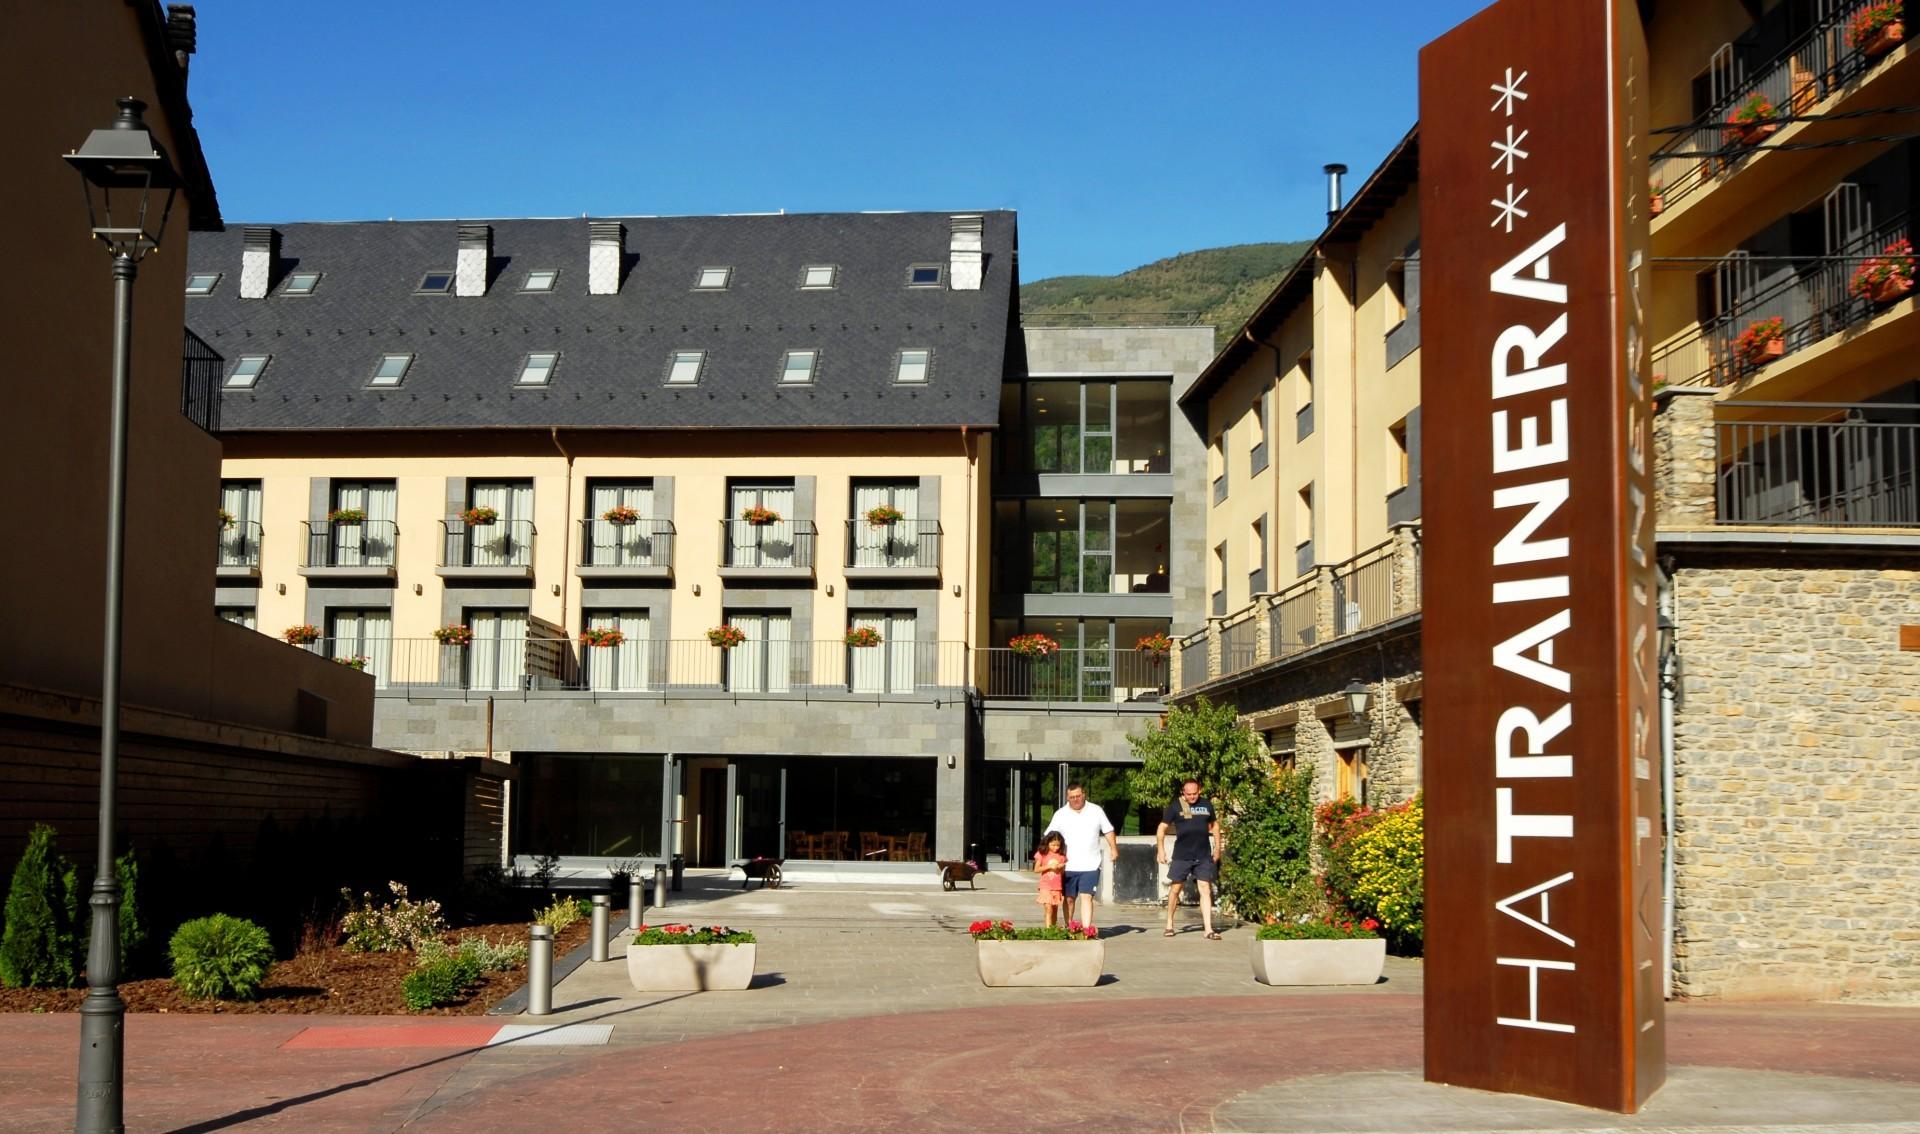 HOTEL APARTAMENTS TRAINERA in ESTERRI D'ÀNEU